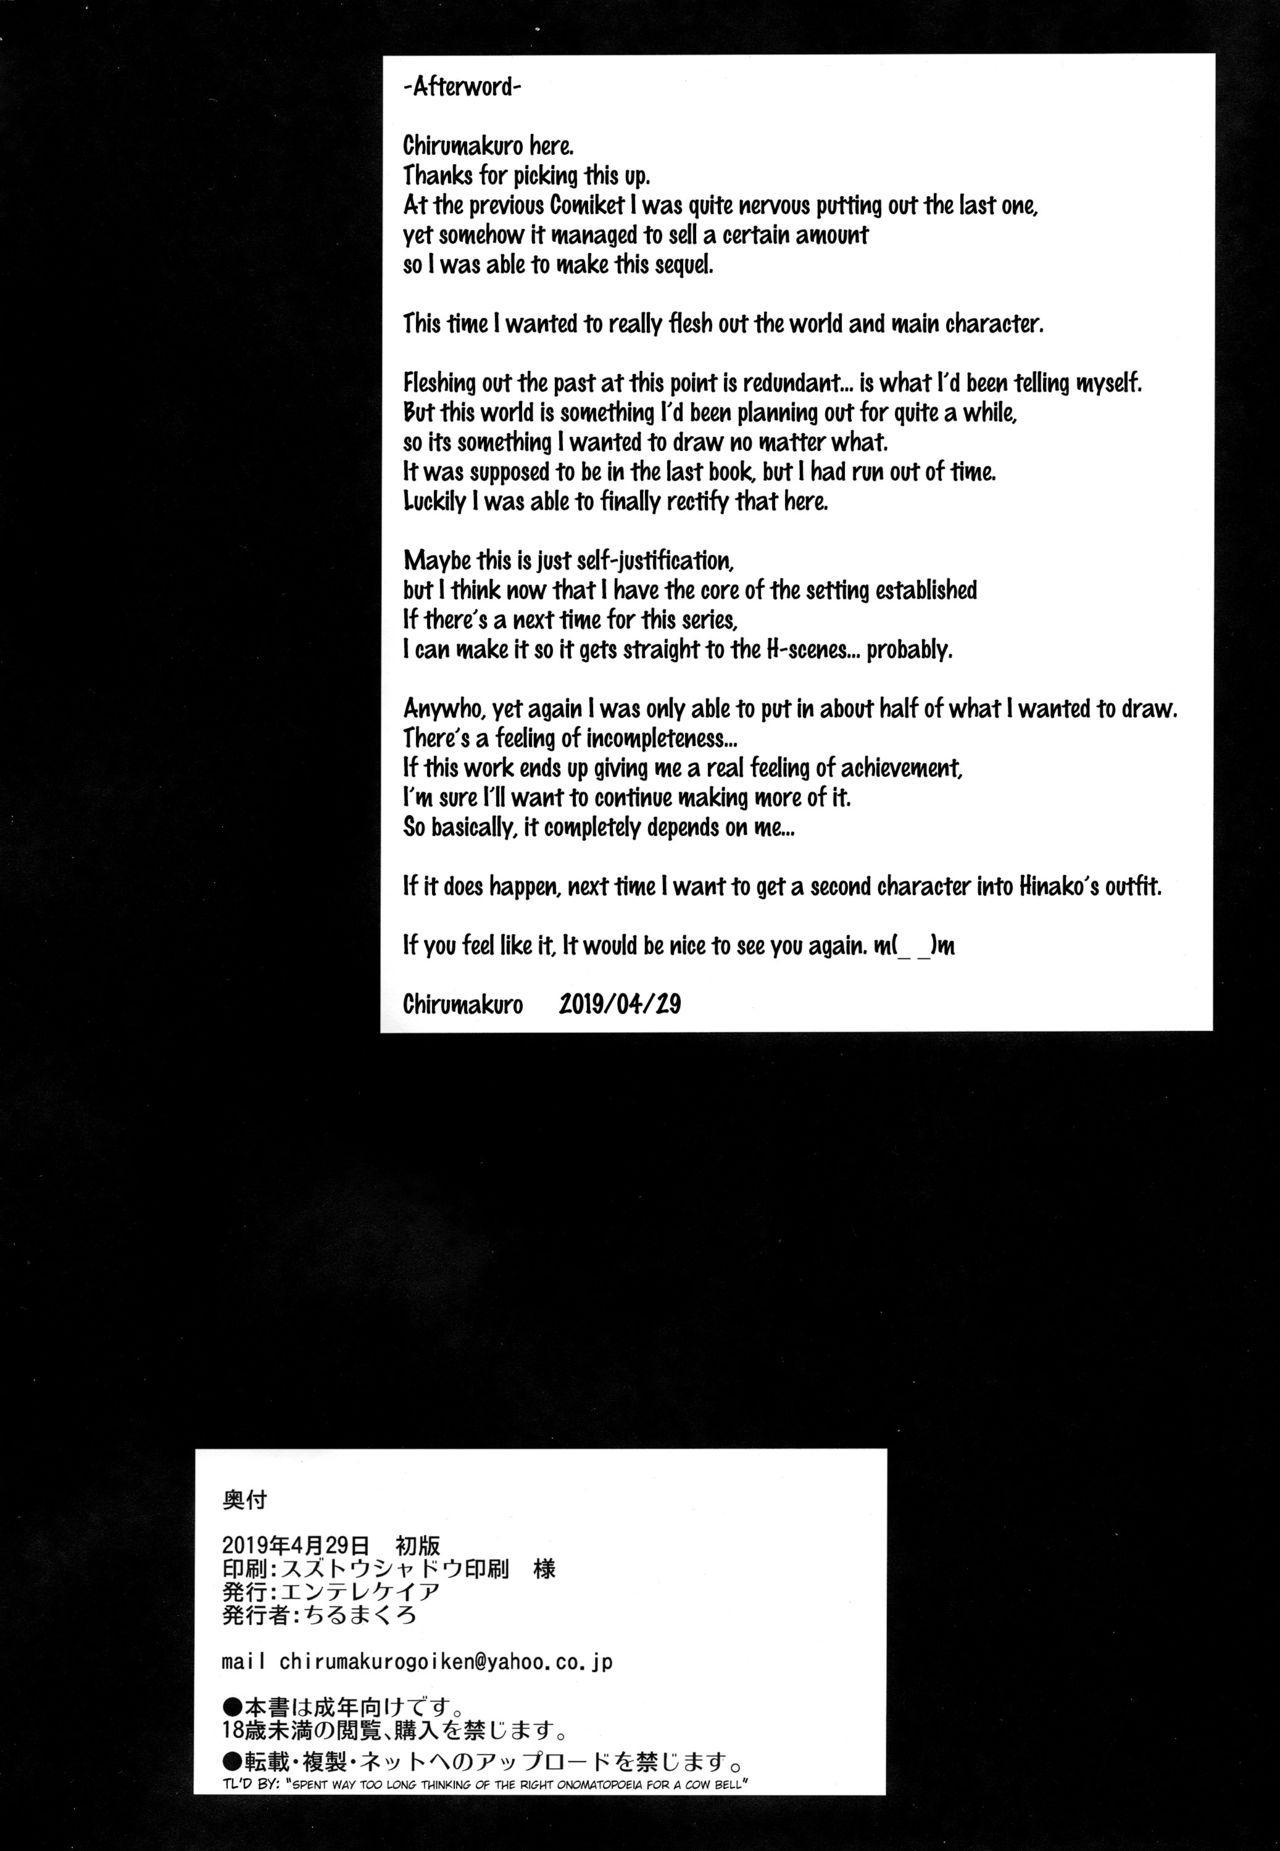 (COMIC1☆15) [Entelekheia (Chirumakuro)] Hinako Ikusei Nisshi 2 ~Hinako no Kako to Genzai~   Hinako Rearing Log 2 - Hinako's Past and Present [English] 31